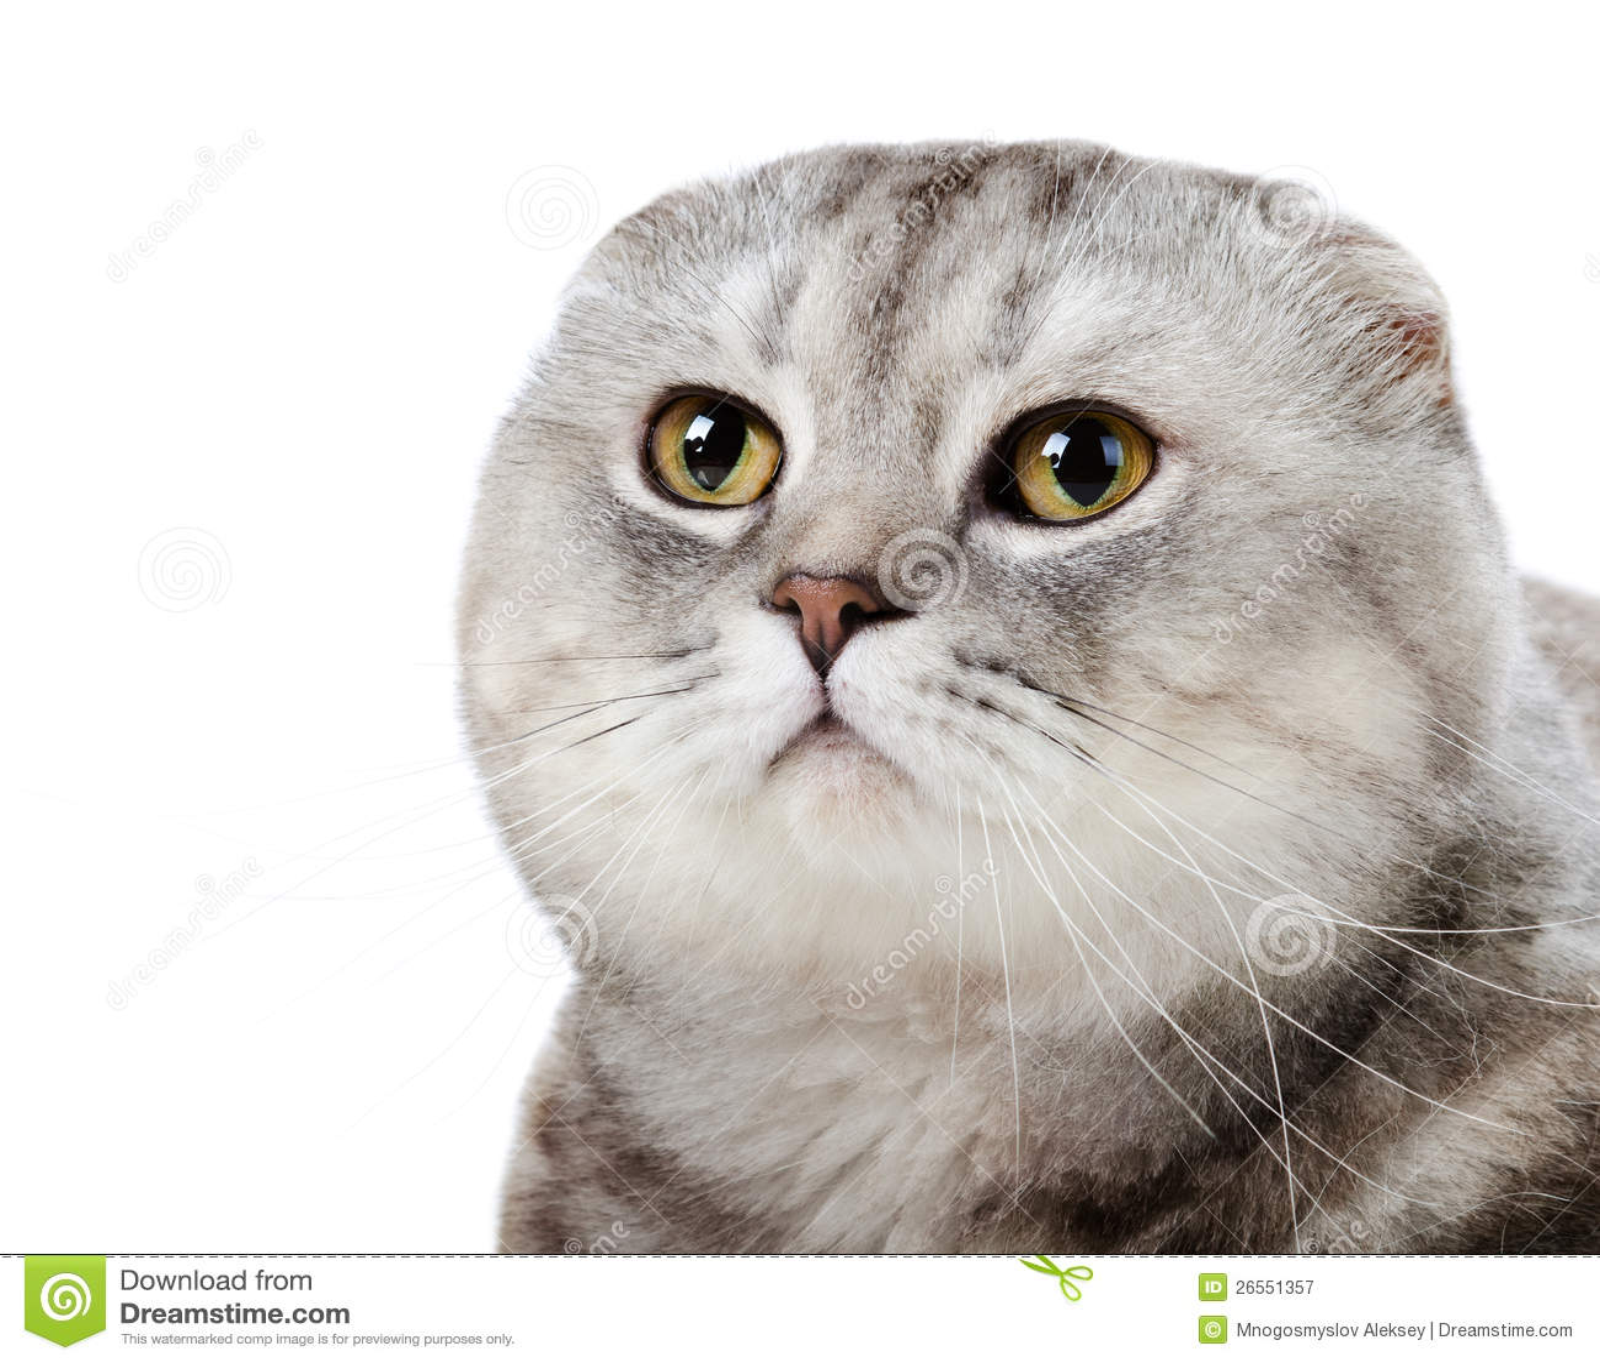 halfe pers kitten